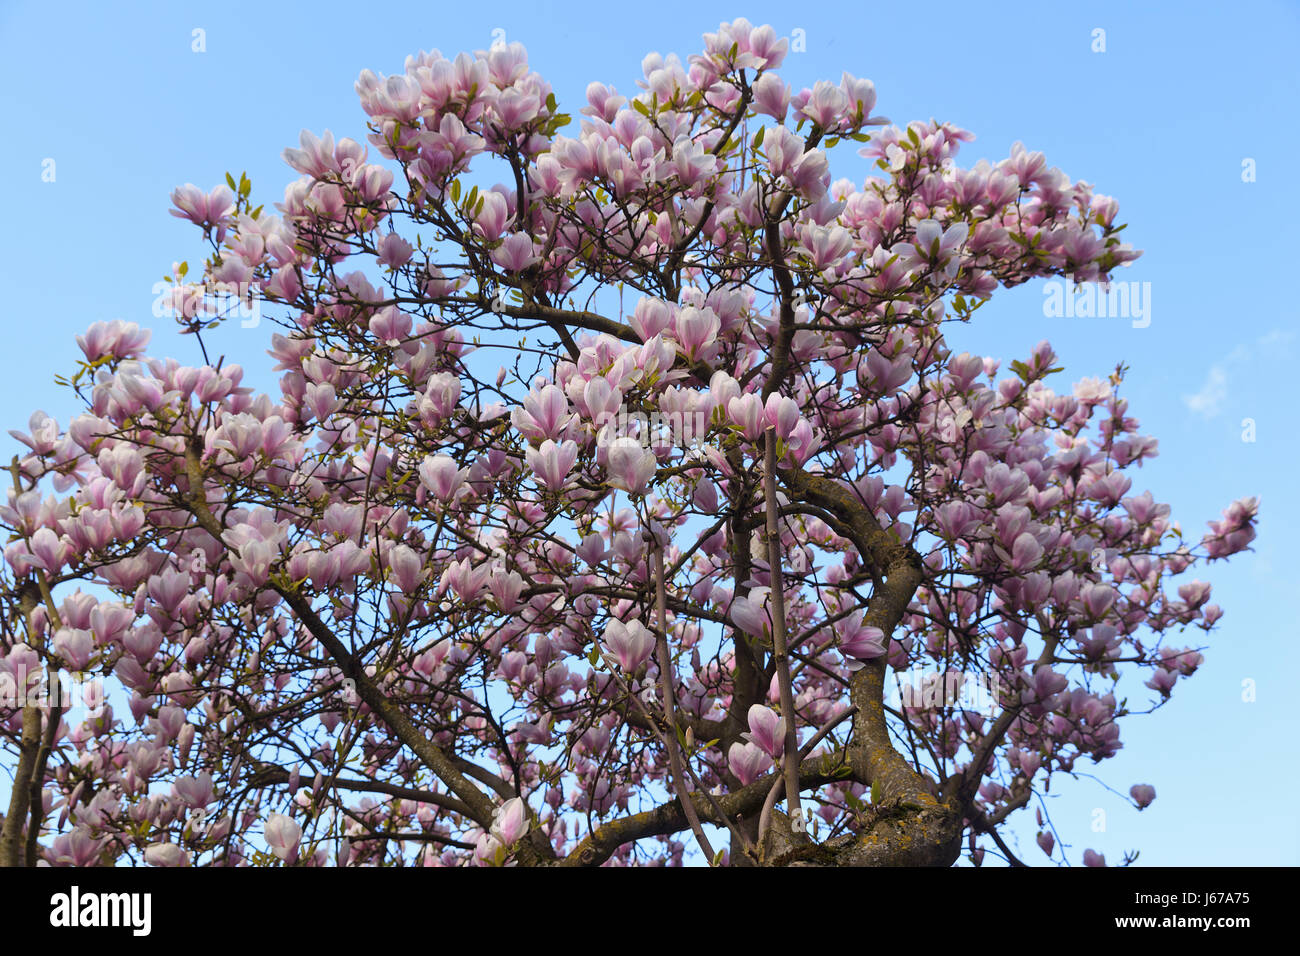 Pink Magnolia Tree In Full Bloom Stock Photo 141532585 Alamy